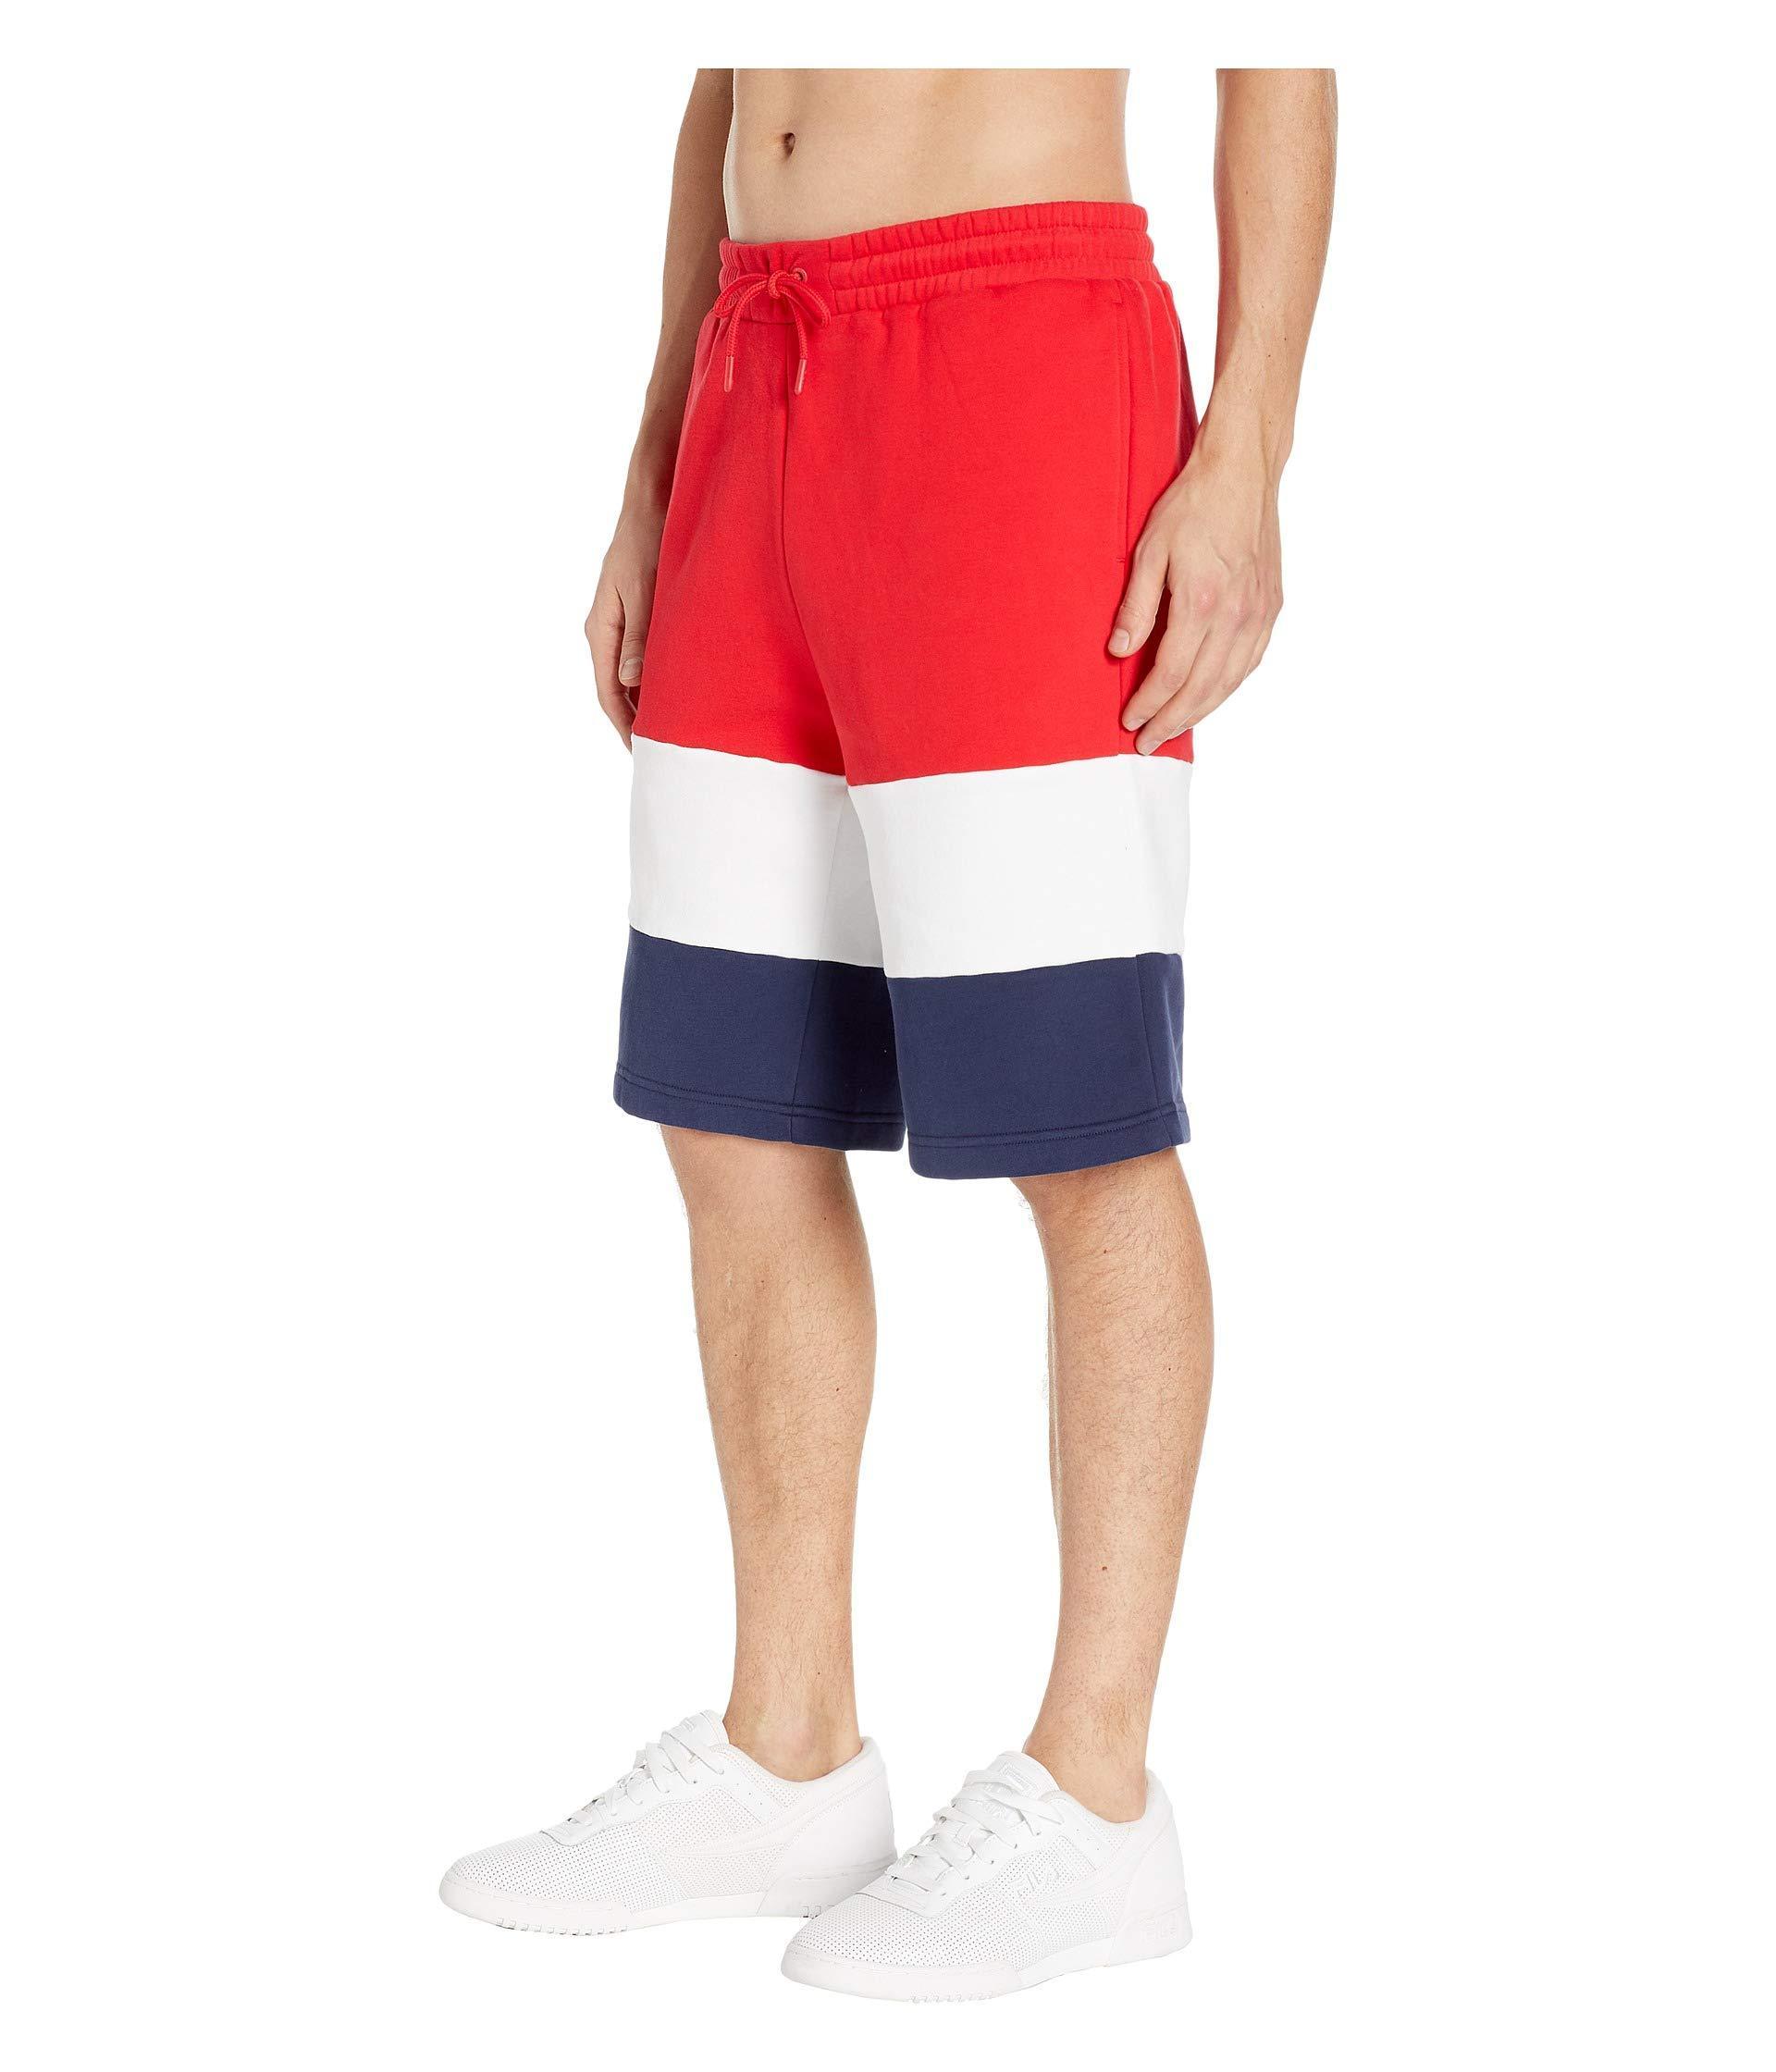 3814c2b1c779 Lyst - Fila Alanzo Shorts (red white navy) Men s Shorts for Men